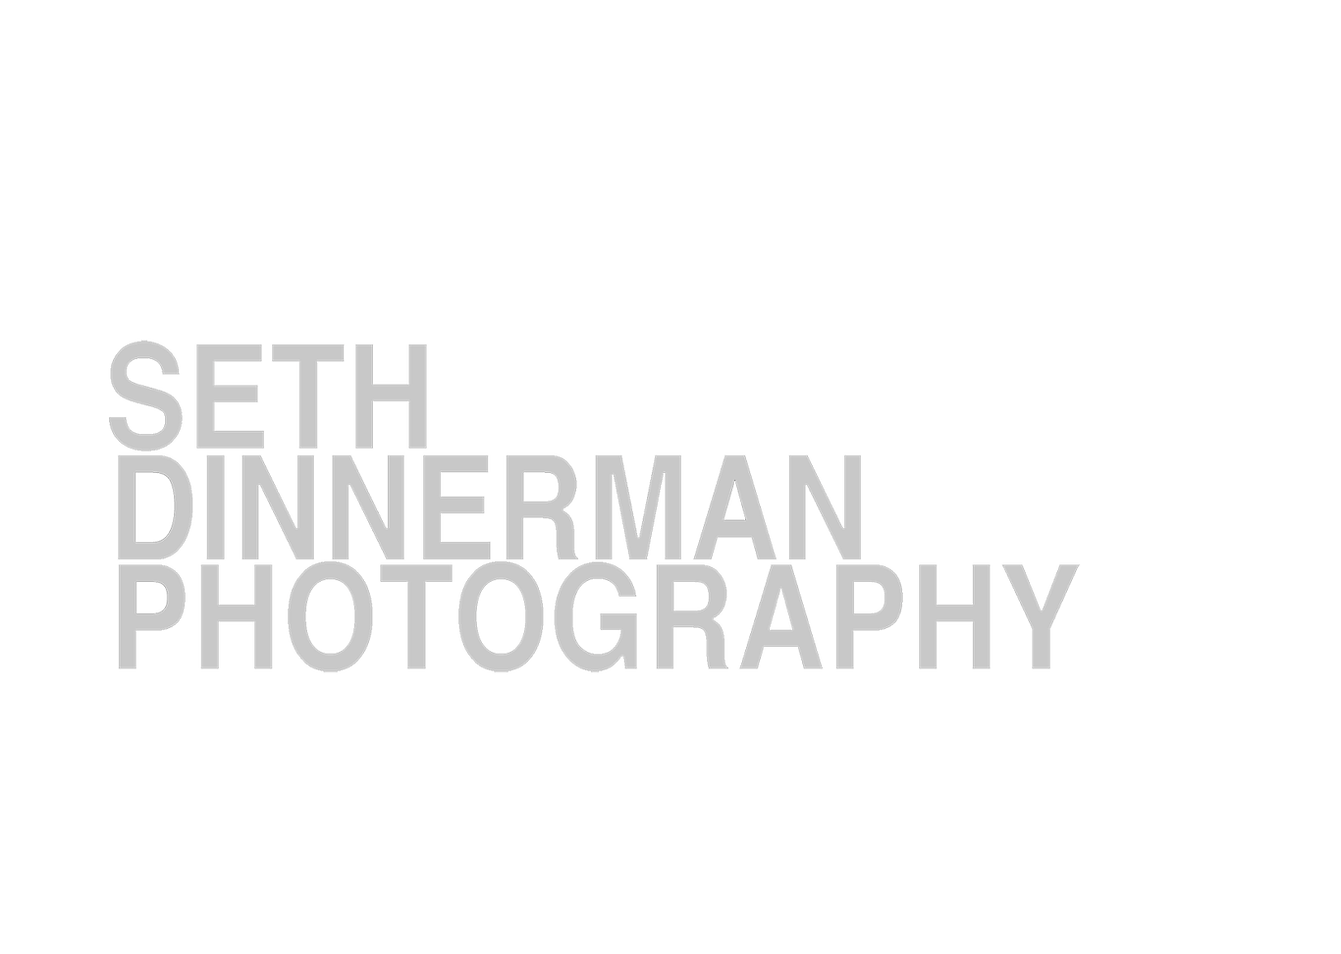 SETHDINNERMANPHOTOGRAPHY-3.tif